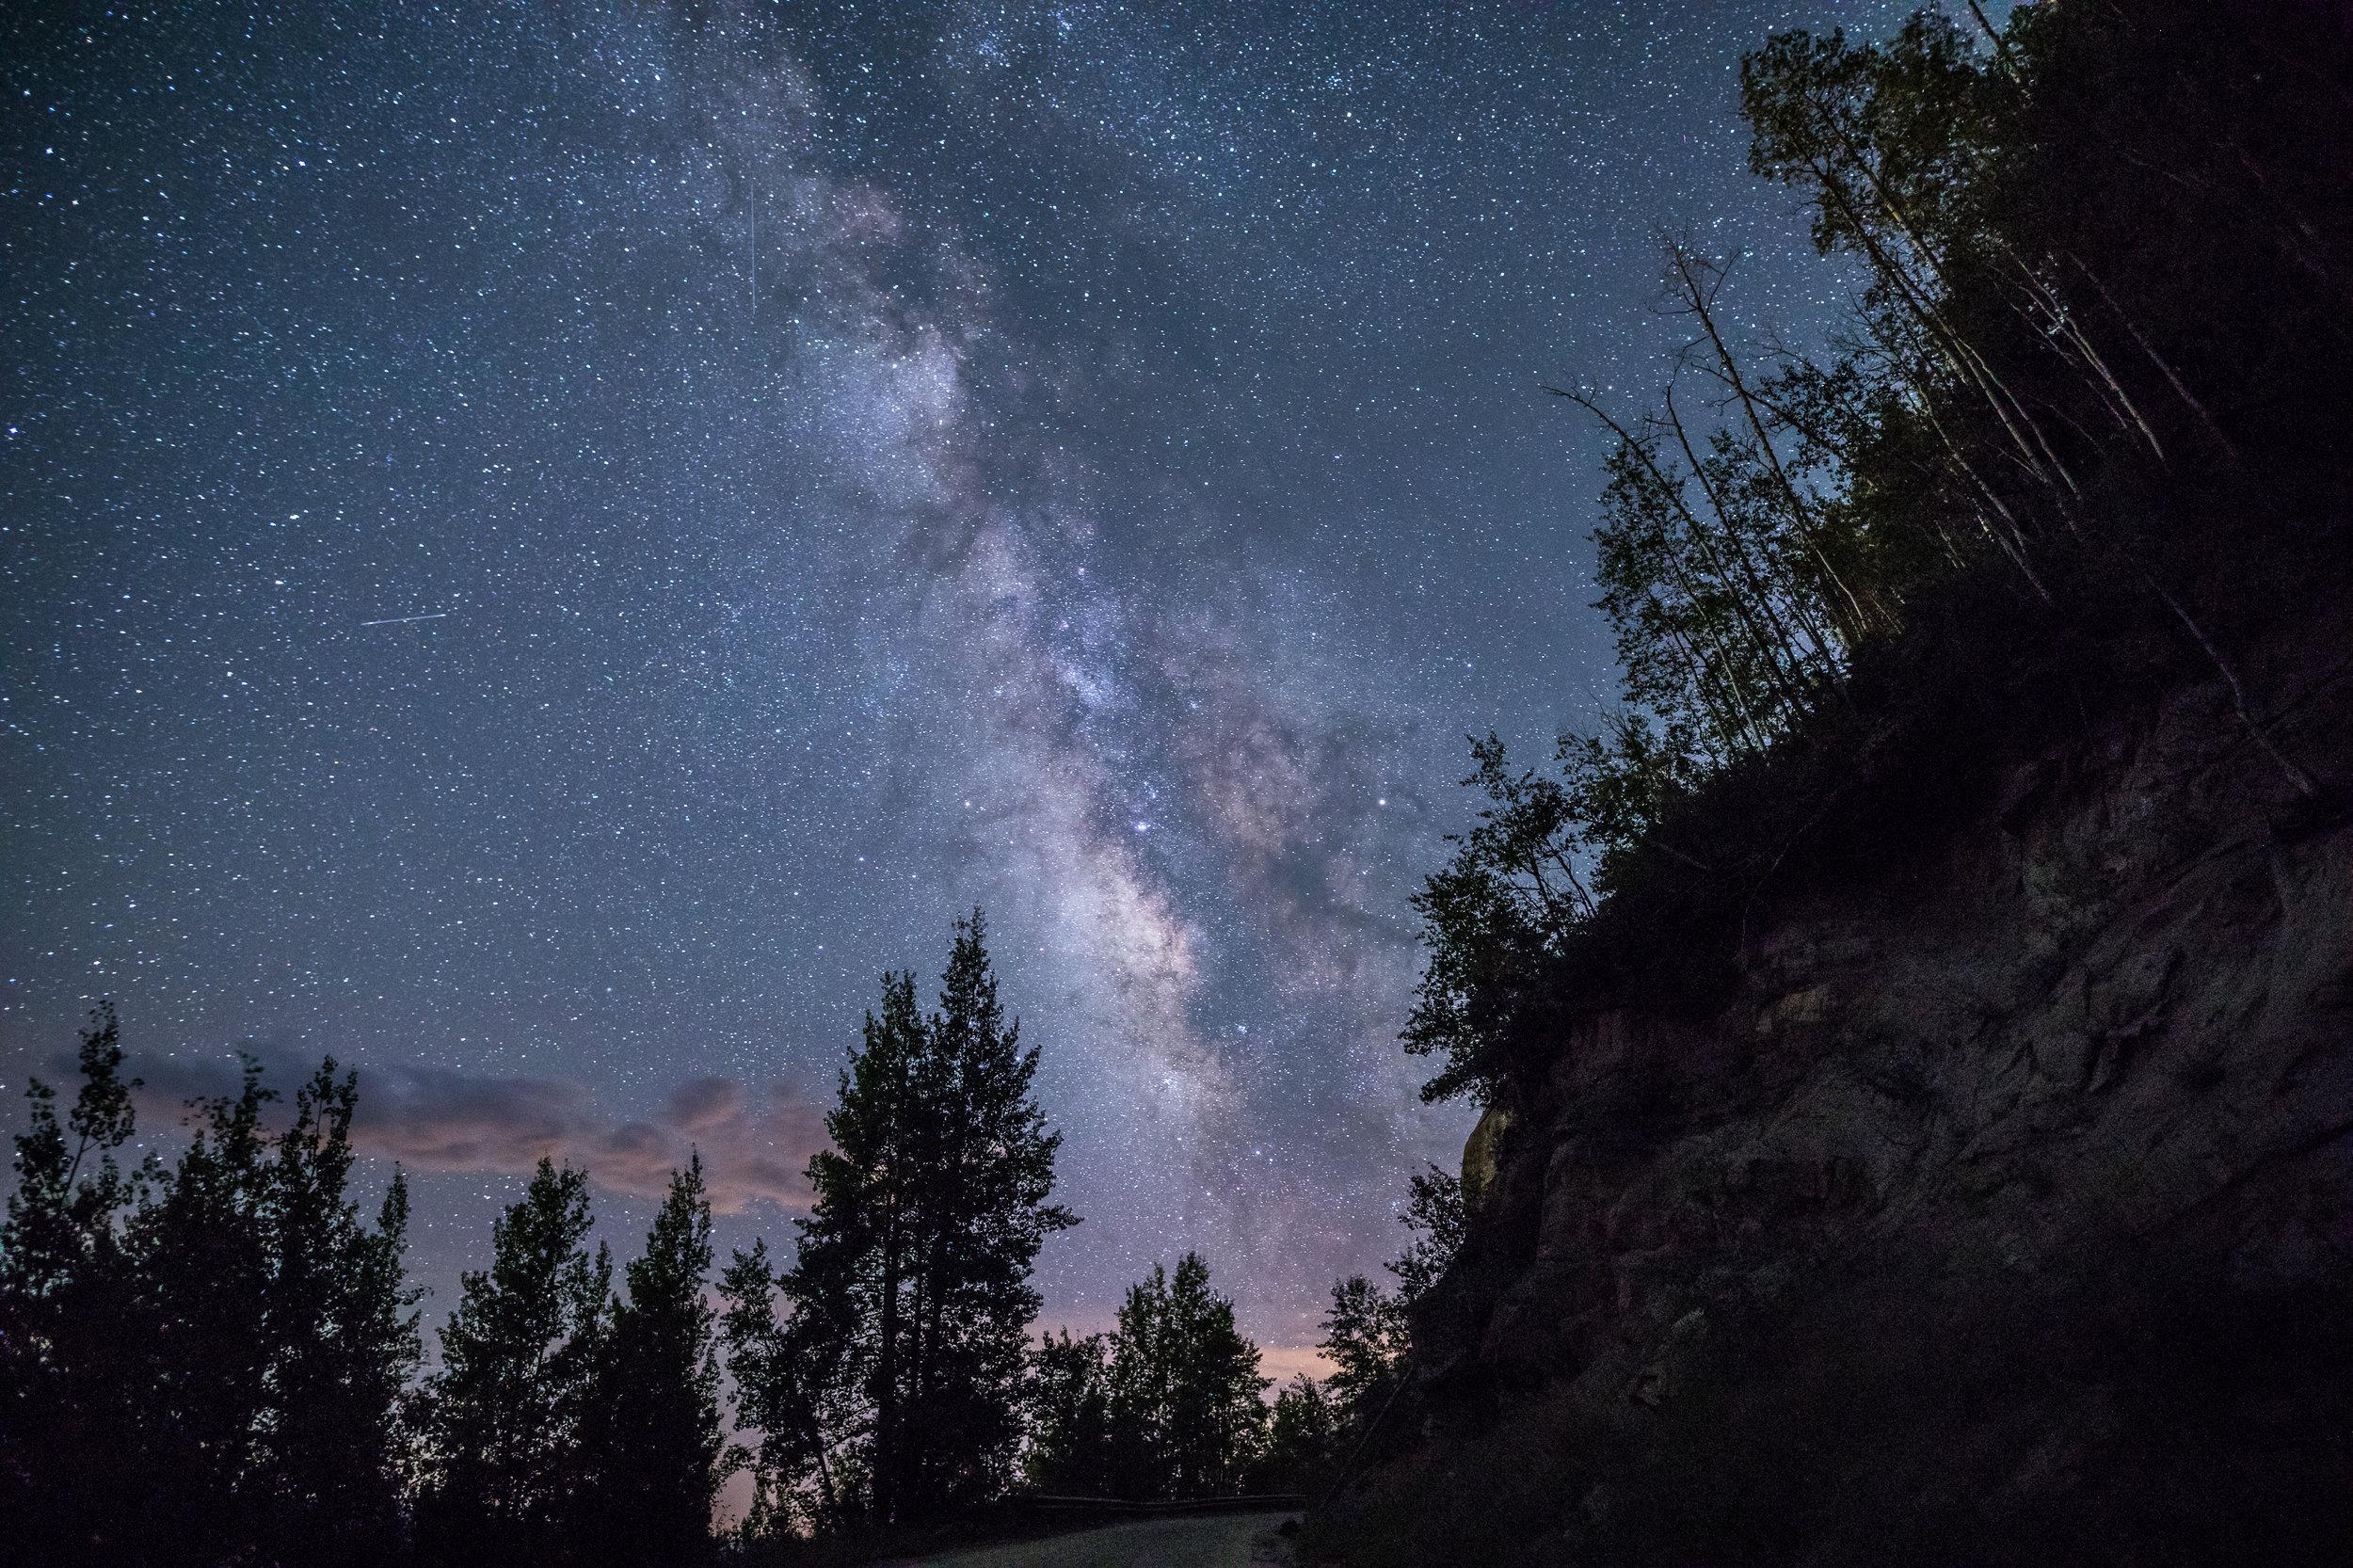 Purgatory Milky Way, Image # 7589